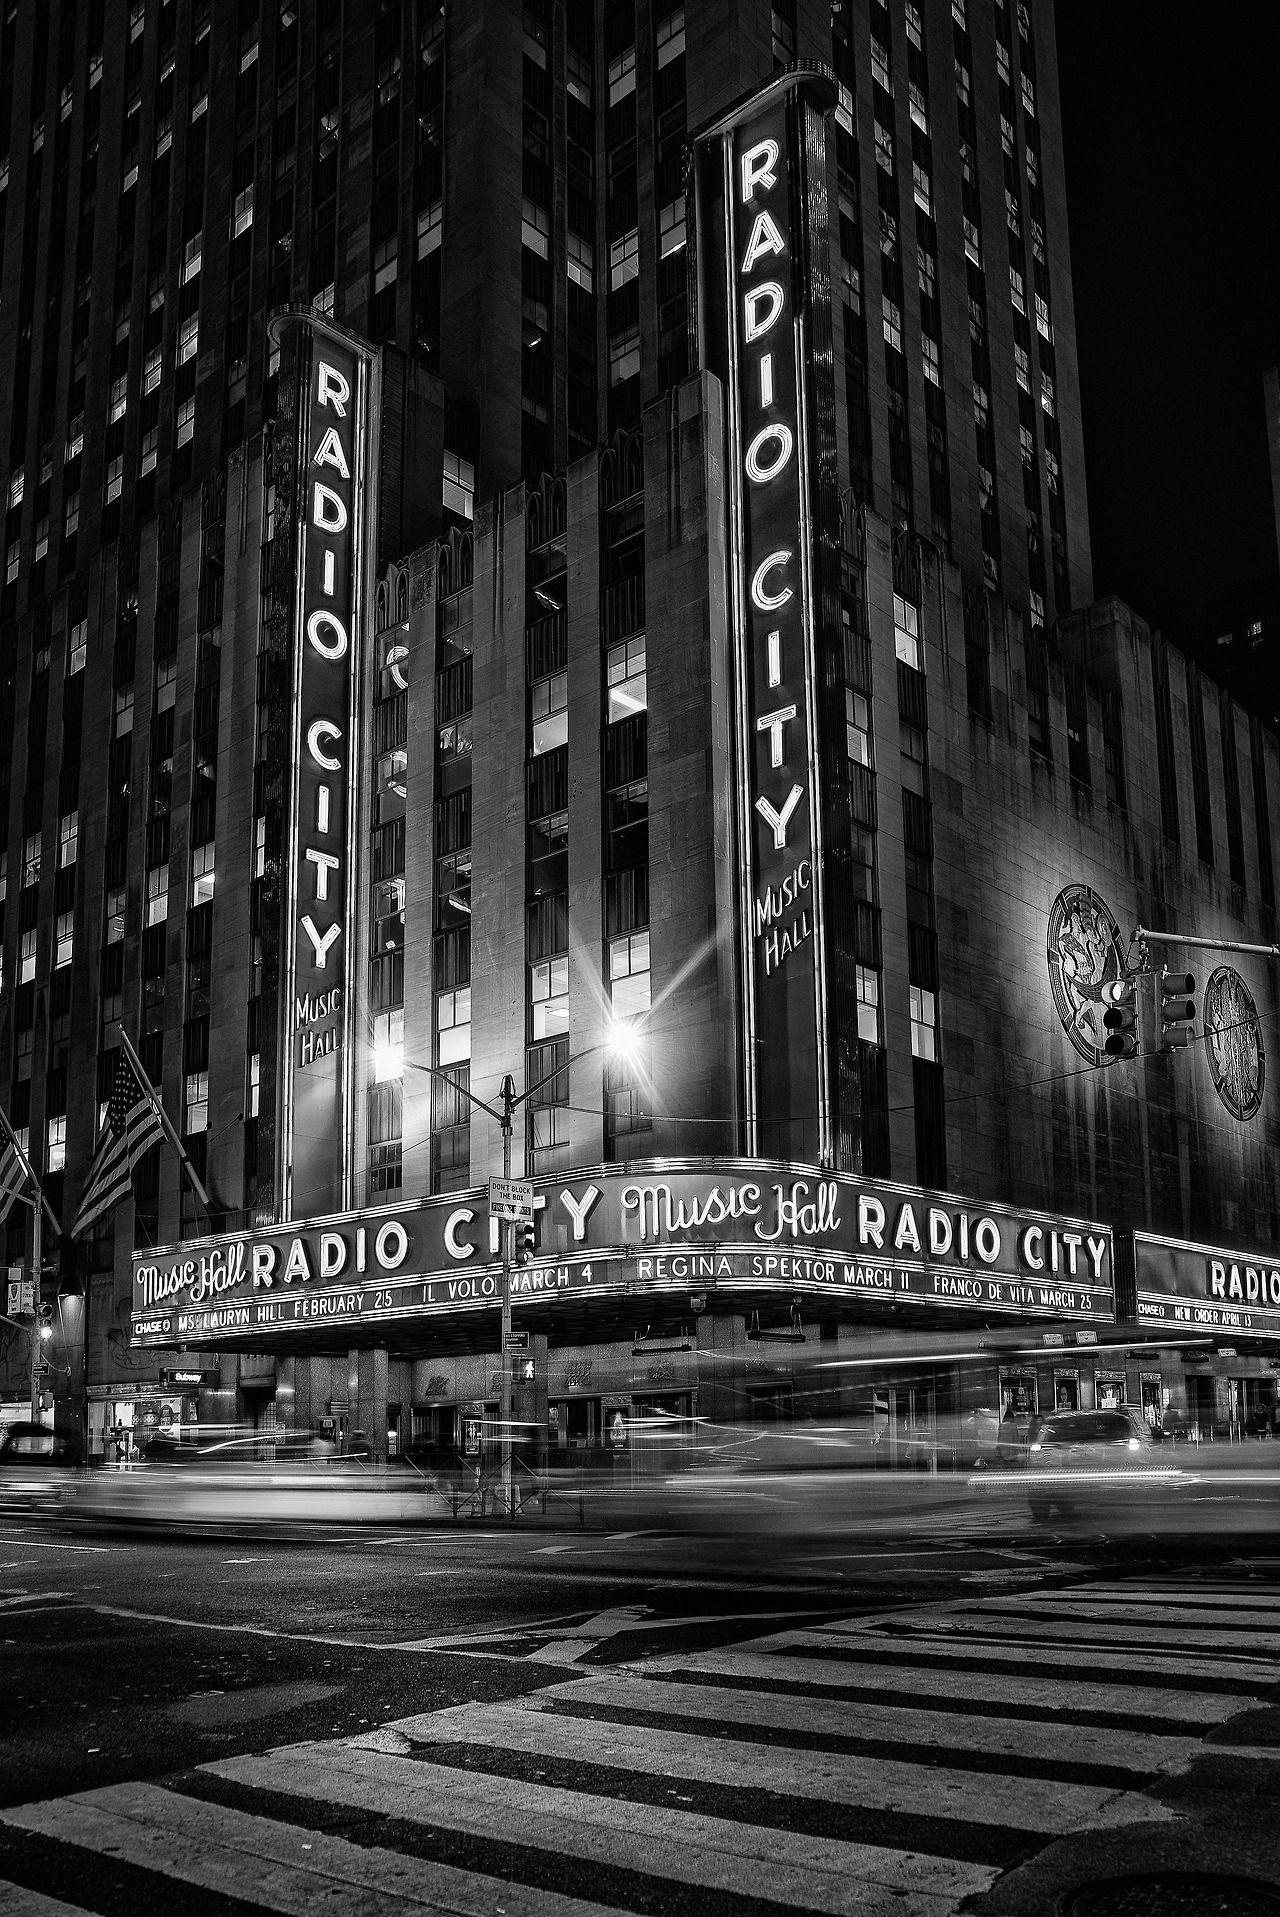 Radio city music hall black and white nights by alexander marte reyes